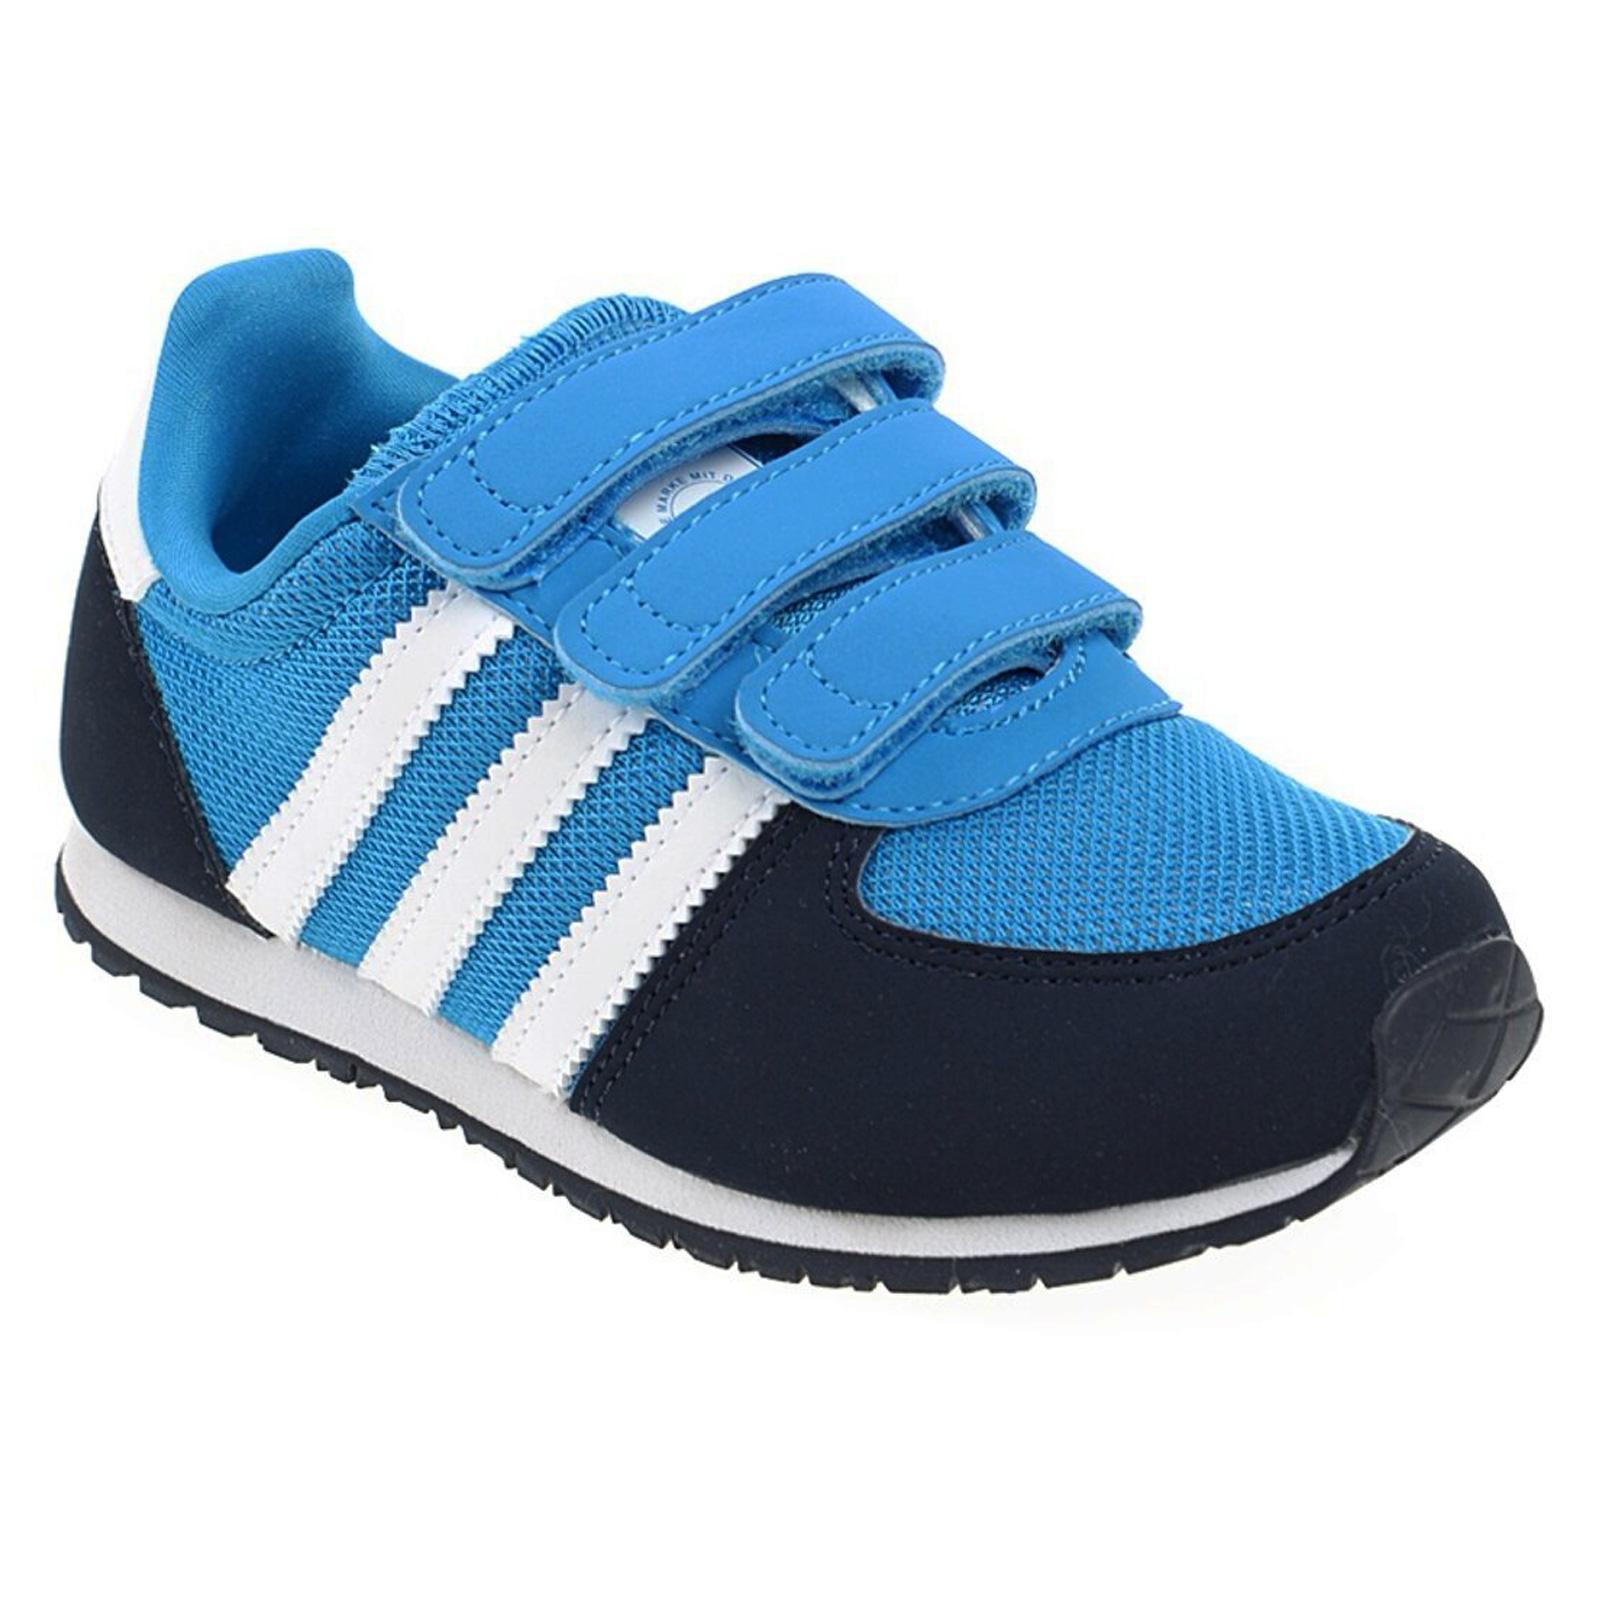 adidas Originals Adistar Racer Sneaker für Herren Blau